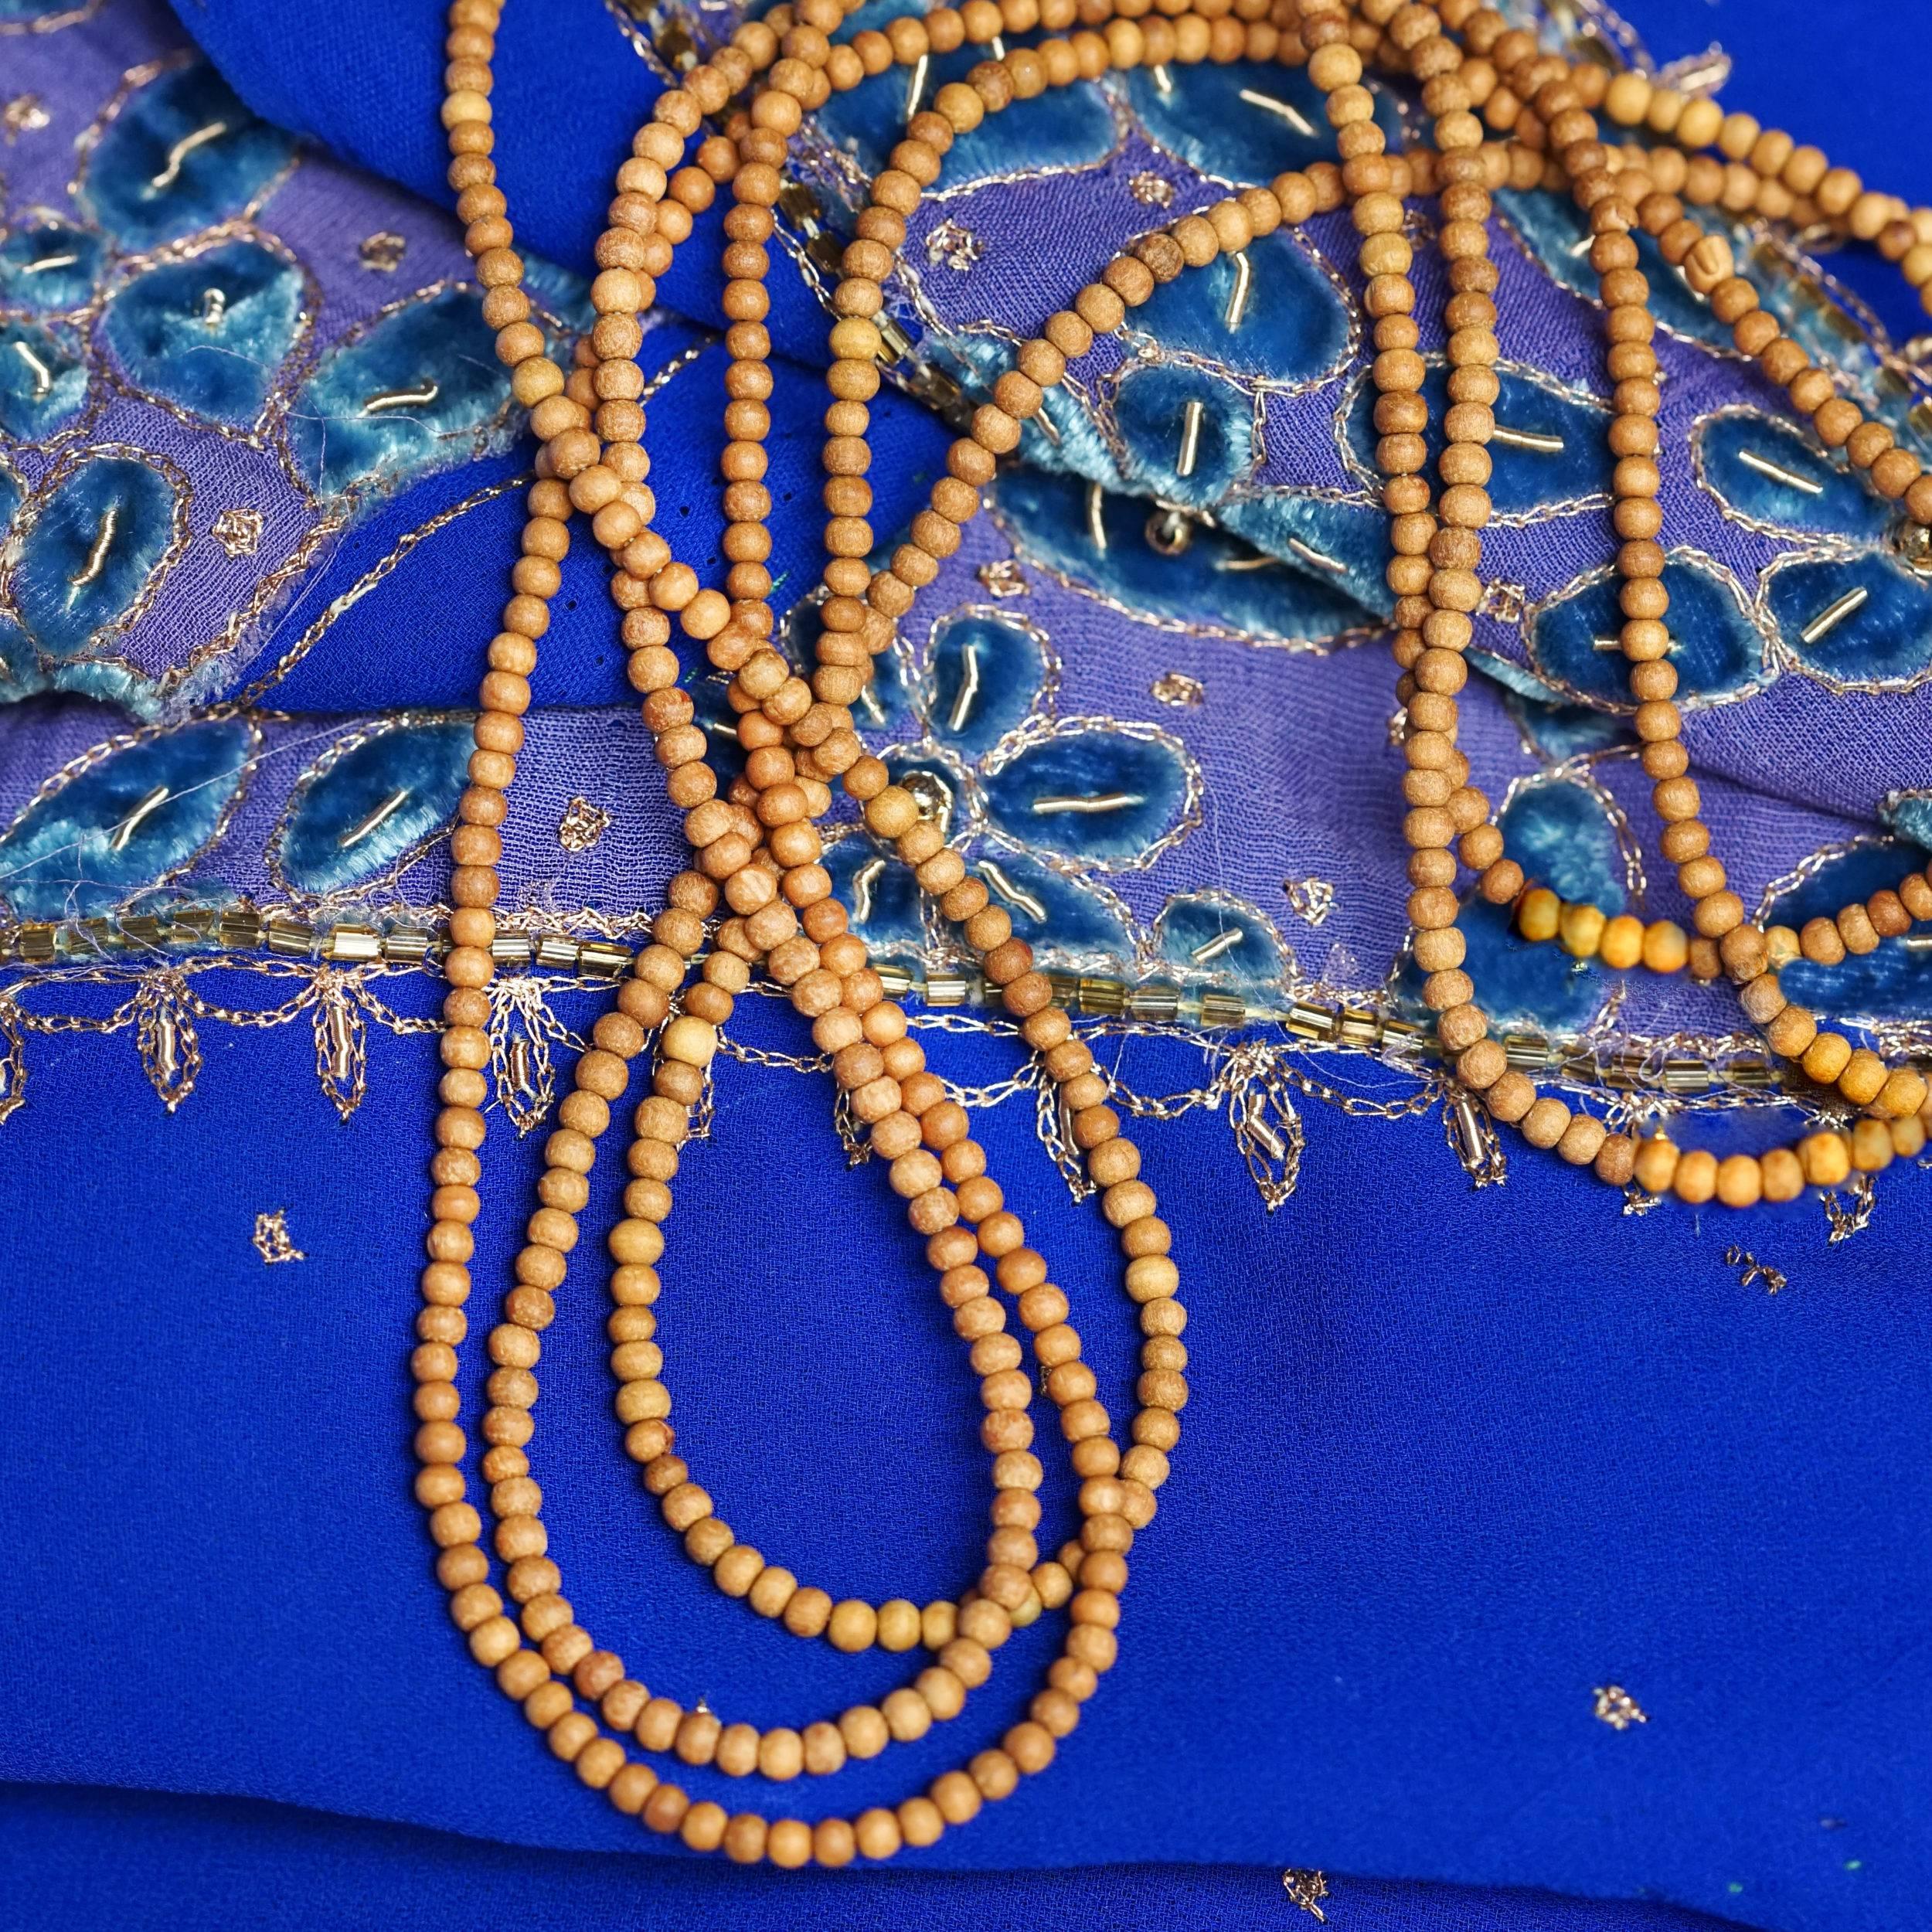 sandalwood necklaces